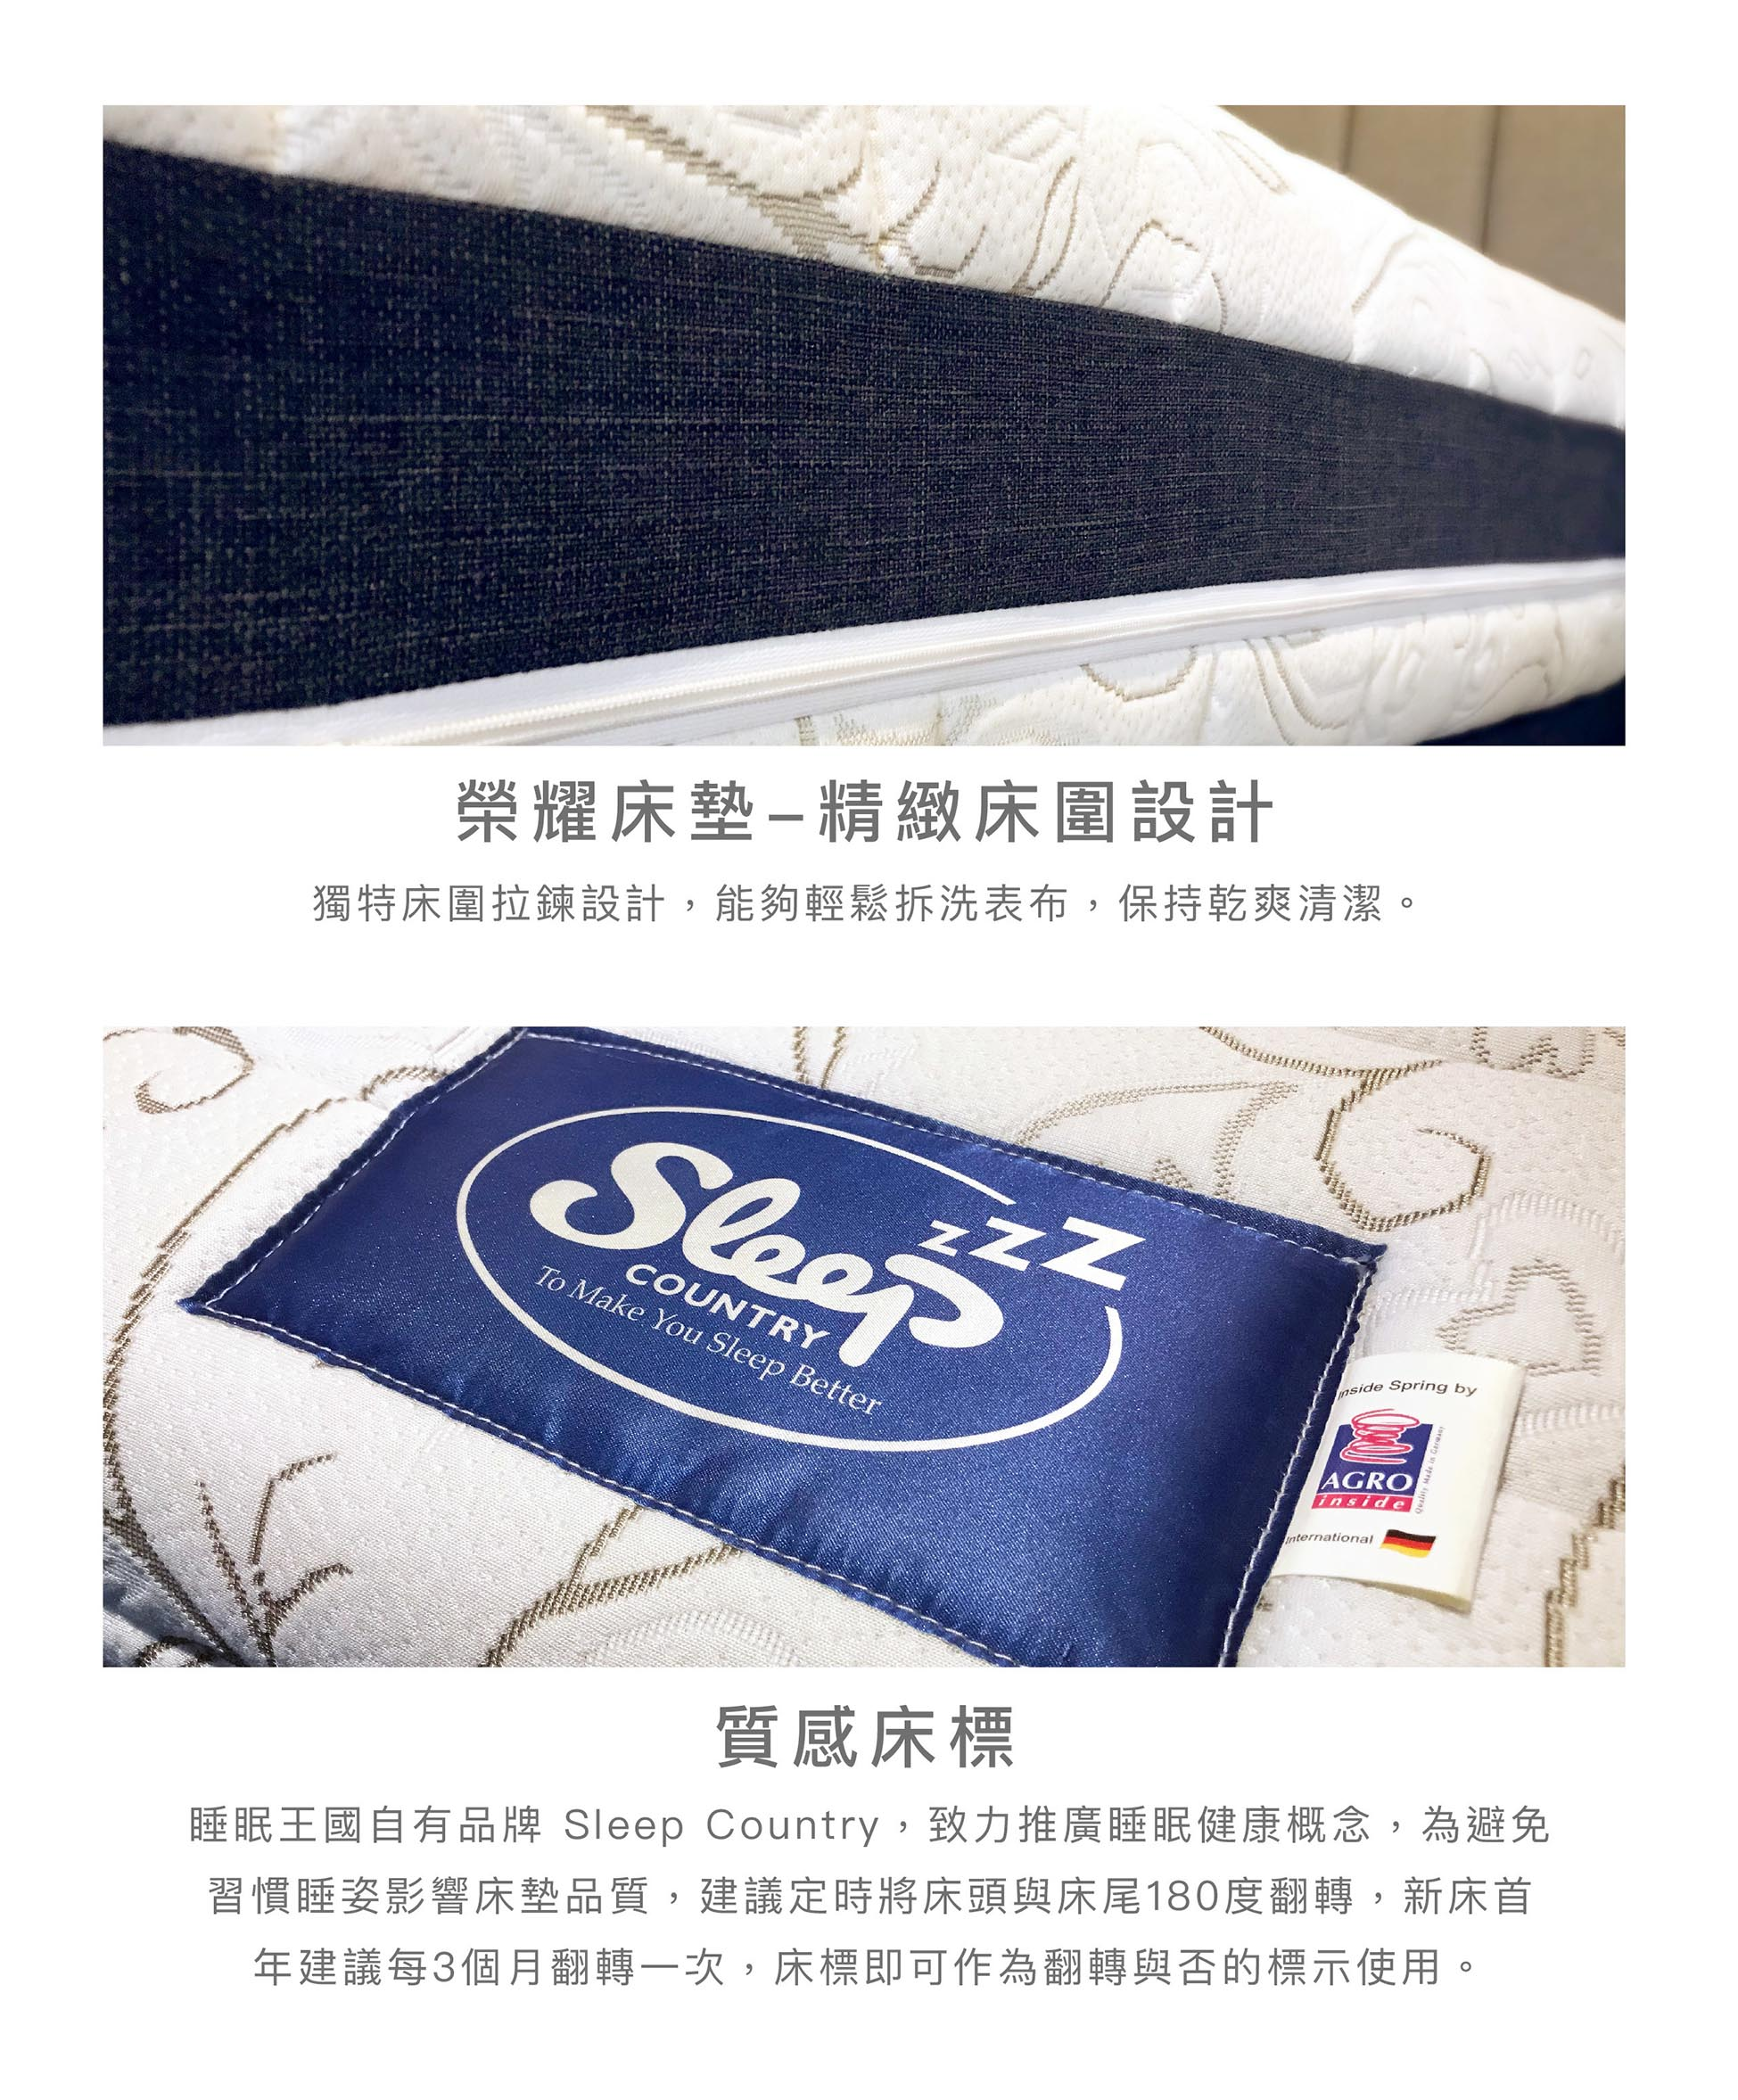 Sleep Country 智能調整床|SMART-801|睡眠王國集團